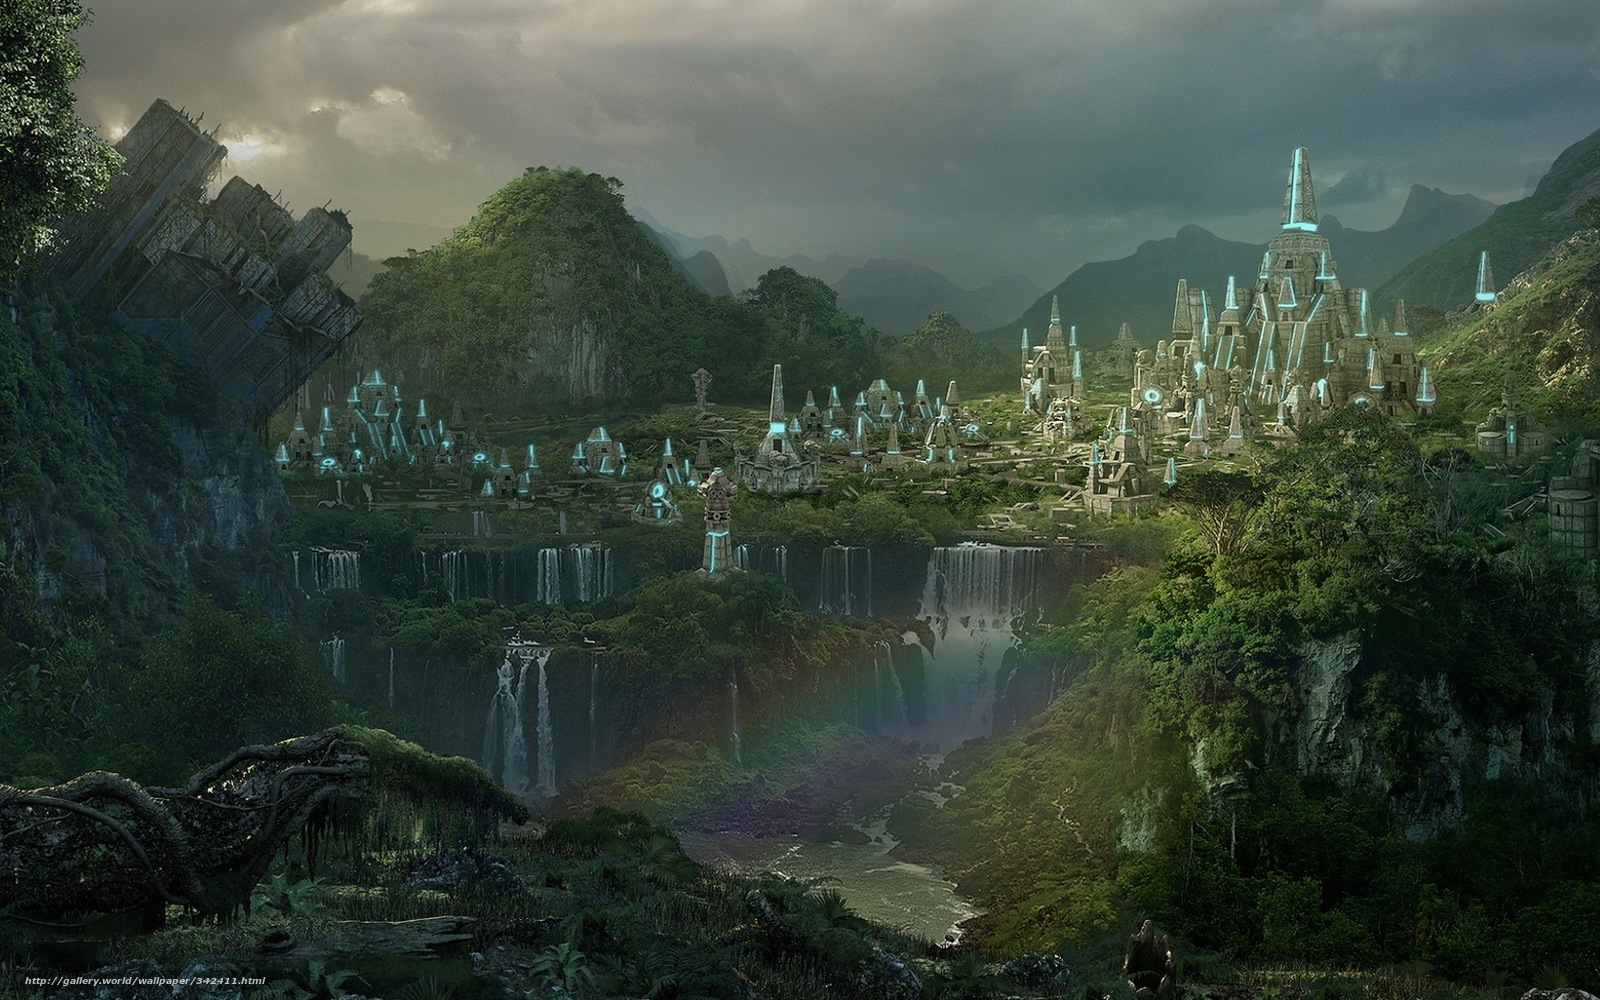 Download wallpaper landscape waterfalls forest city free